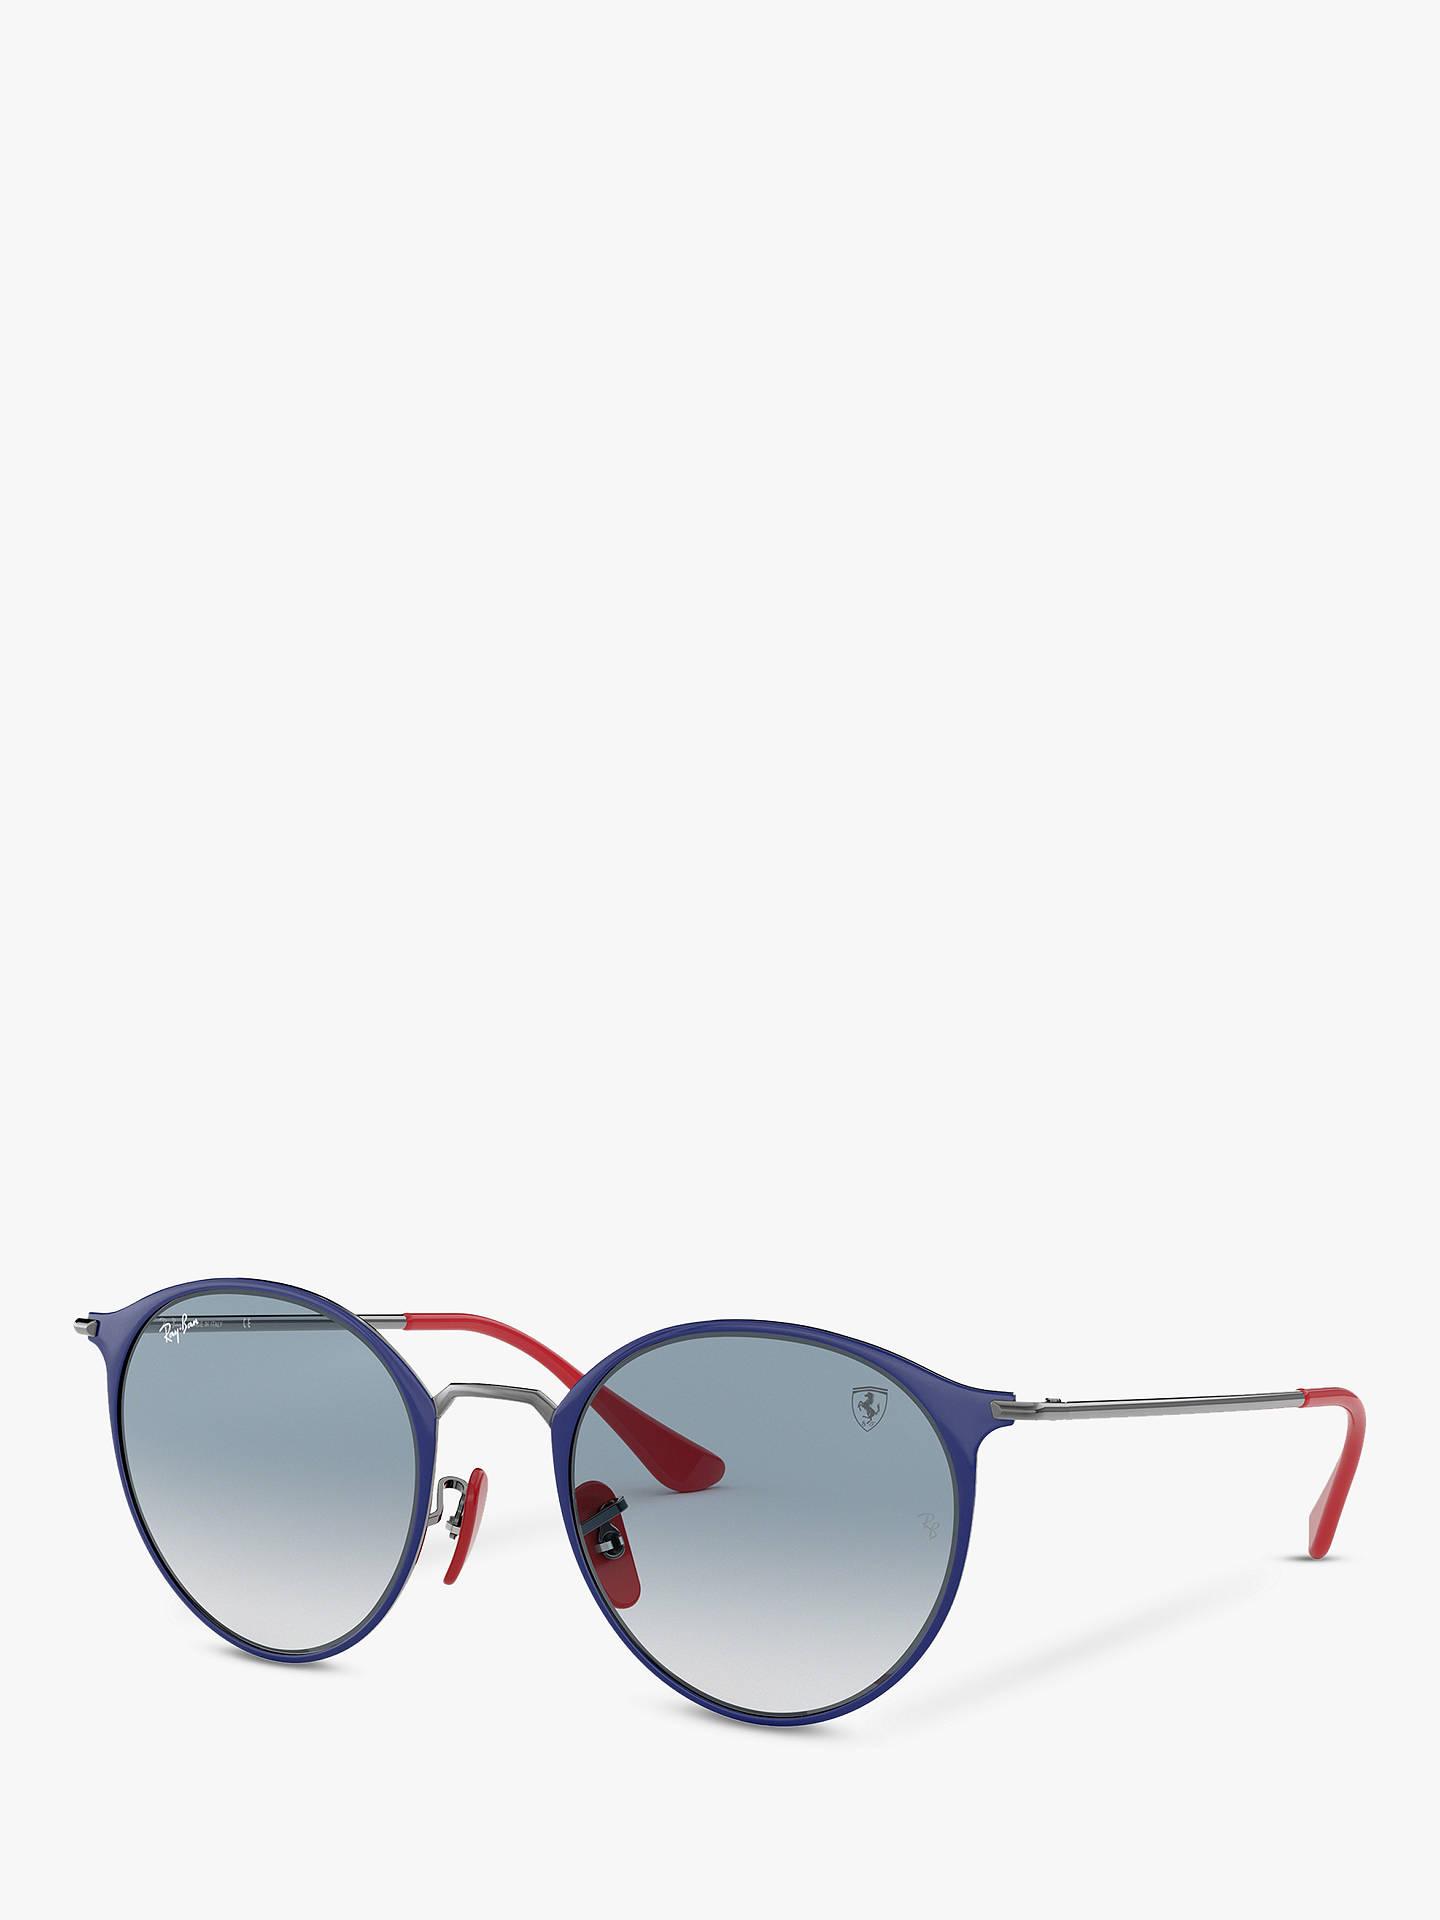 Ray Ban Scuderia Ferrari Collection Rb3574n Unisex Round Sunglasses Gunmetal Blue Light Blue Gradient